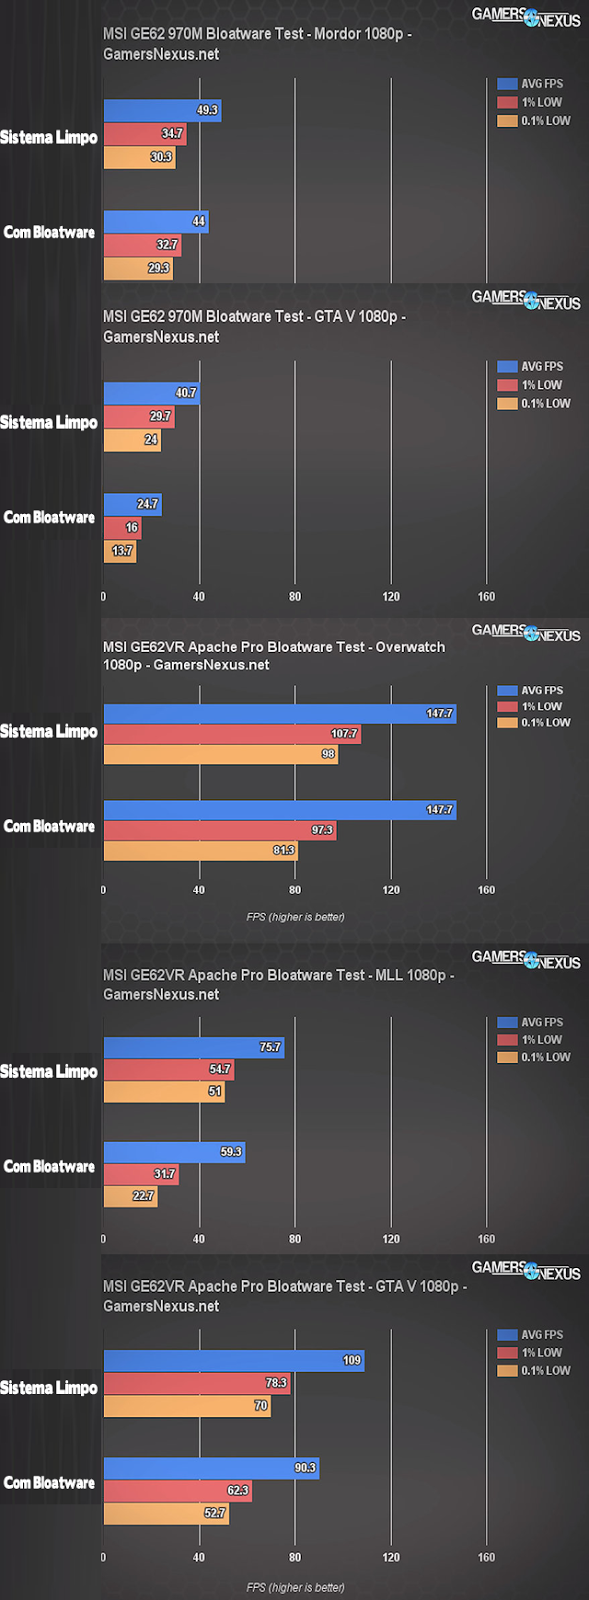 comparativo o efeito de bloatware durante jogos, consumo de fps